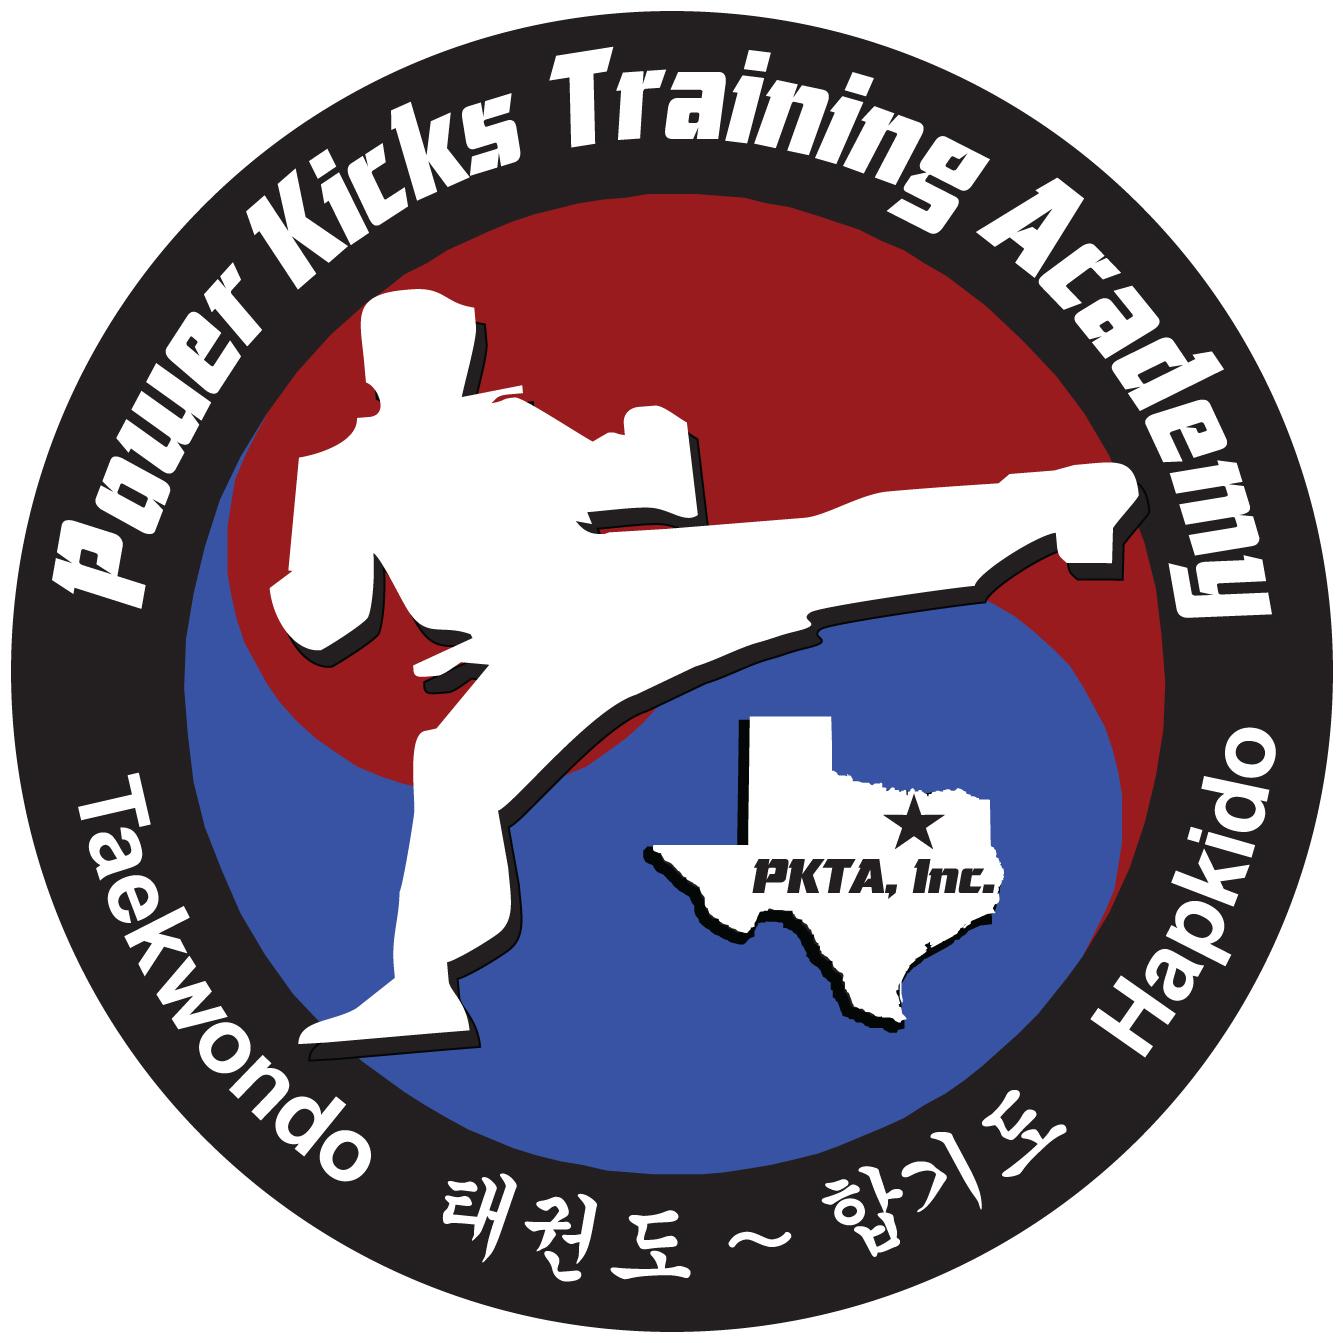 Power Kicks Training Academy